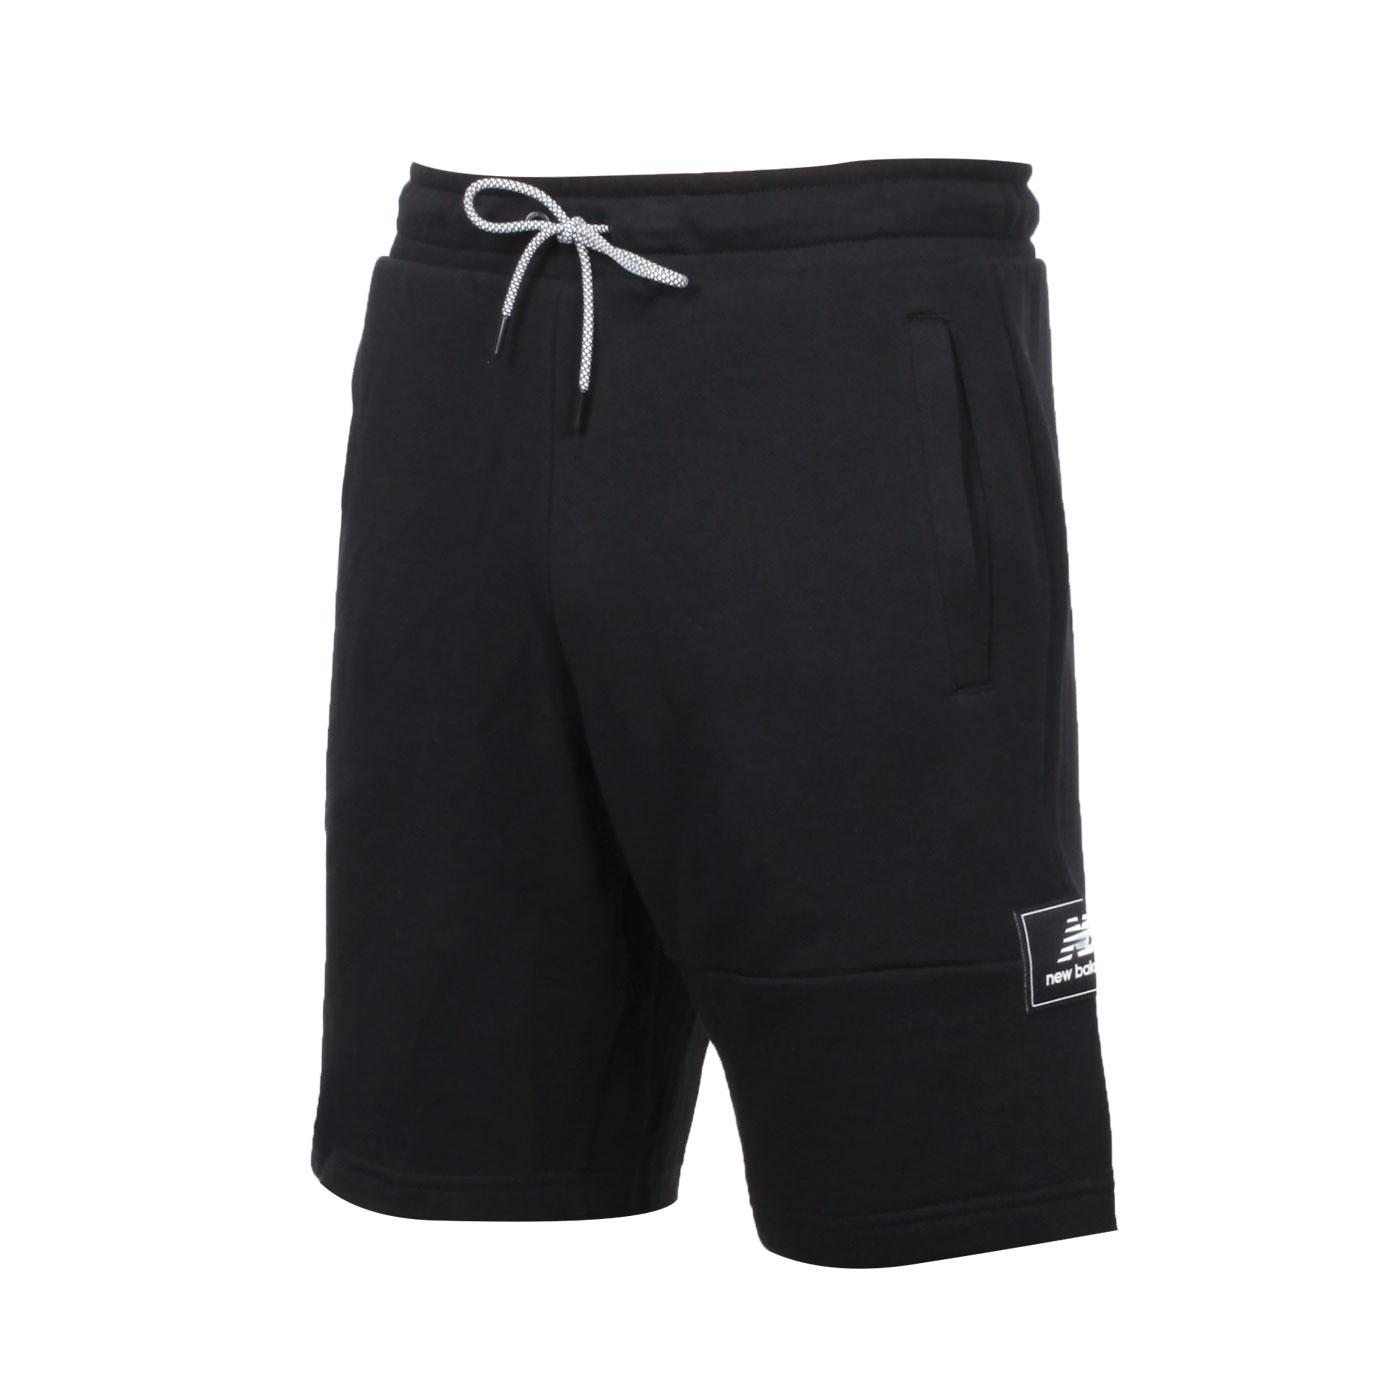 NEW BALANCE 男款棉短褲 AMS13502BK - 黑白